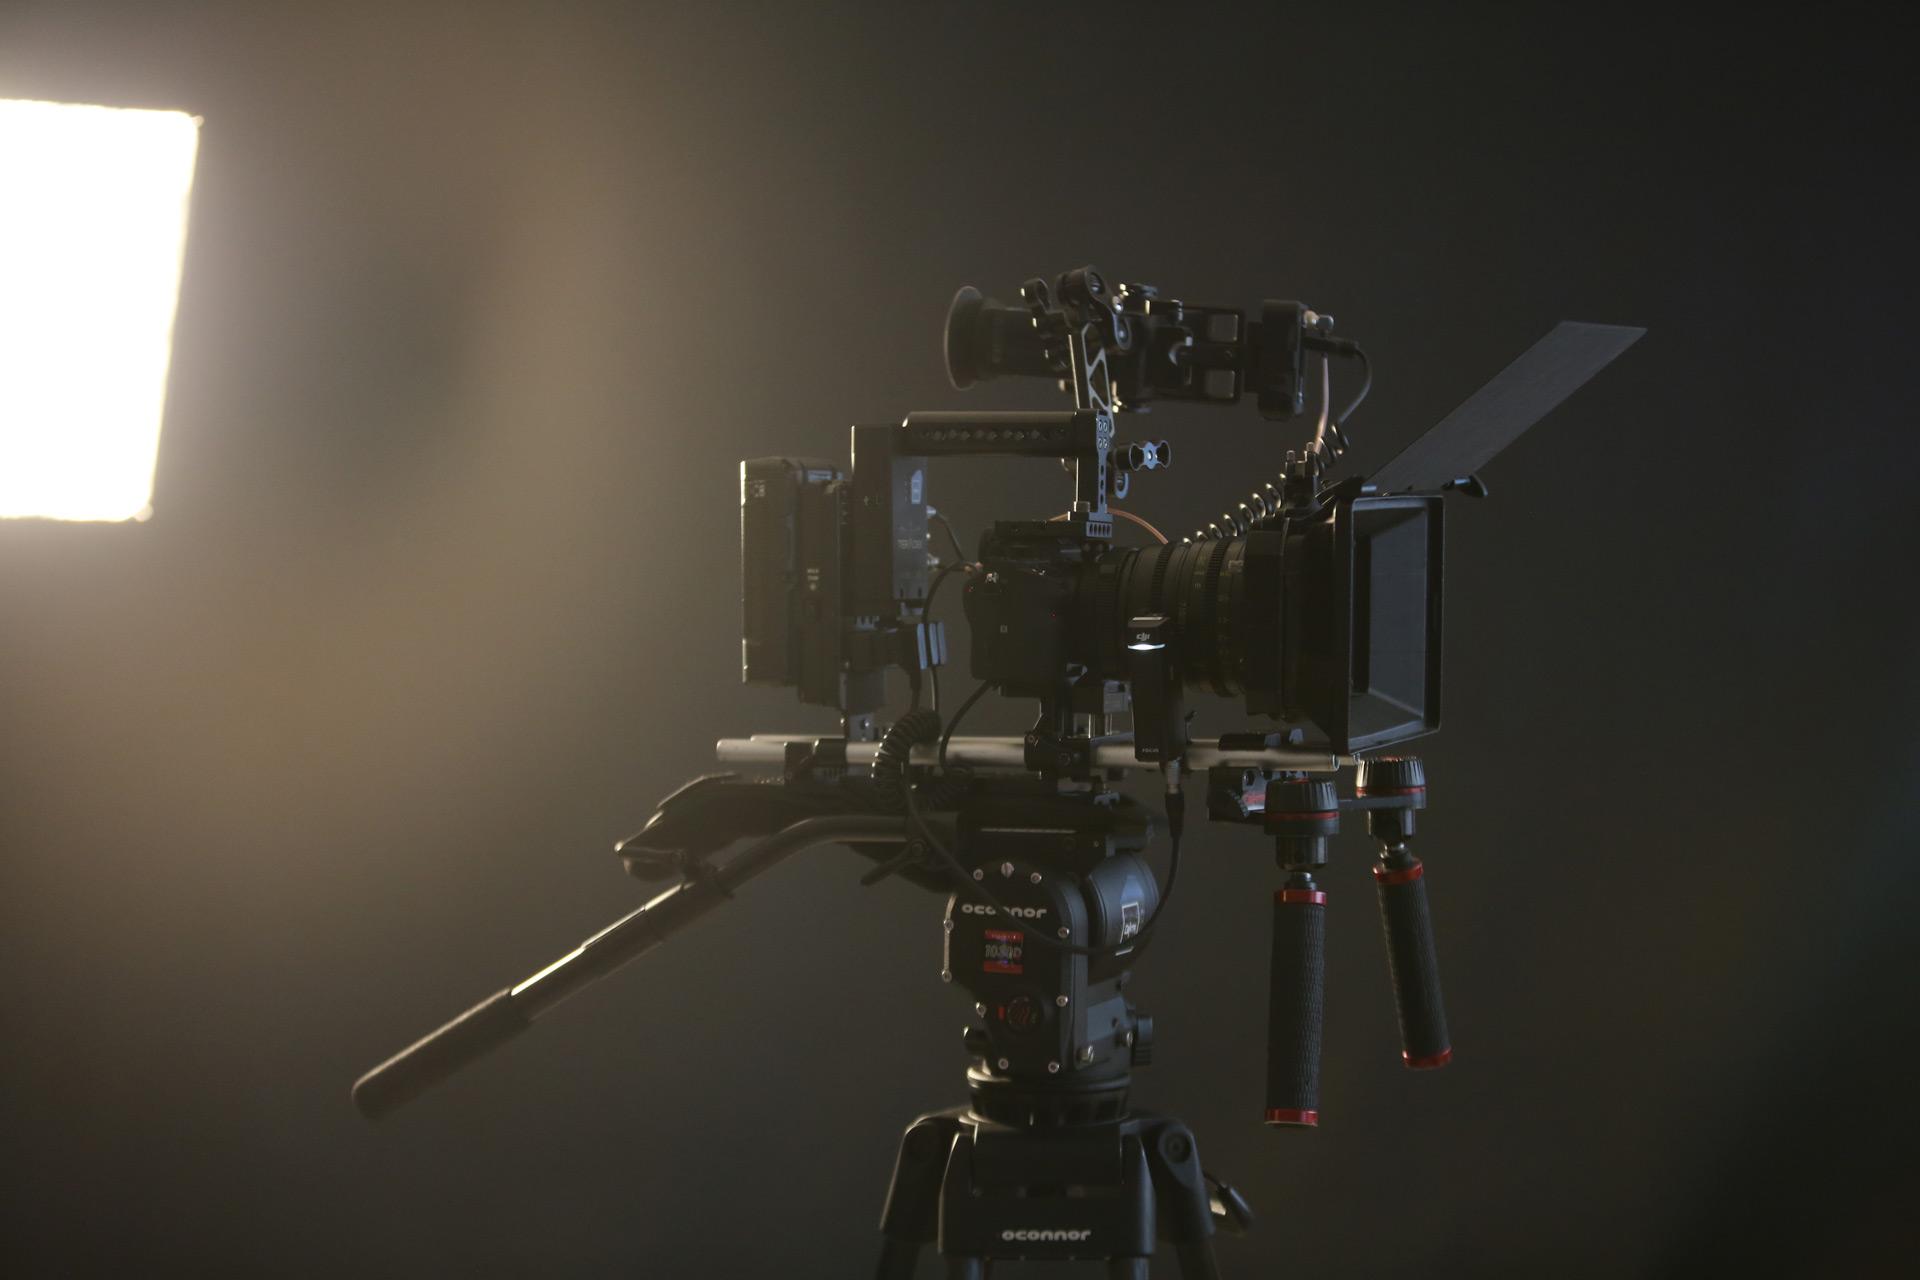 Sony A7S II - Summicron C T2.0